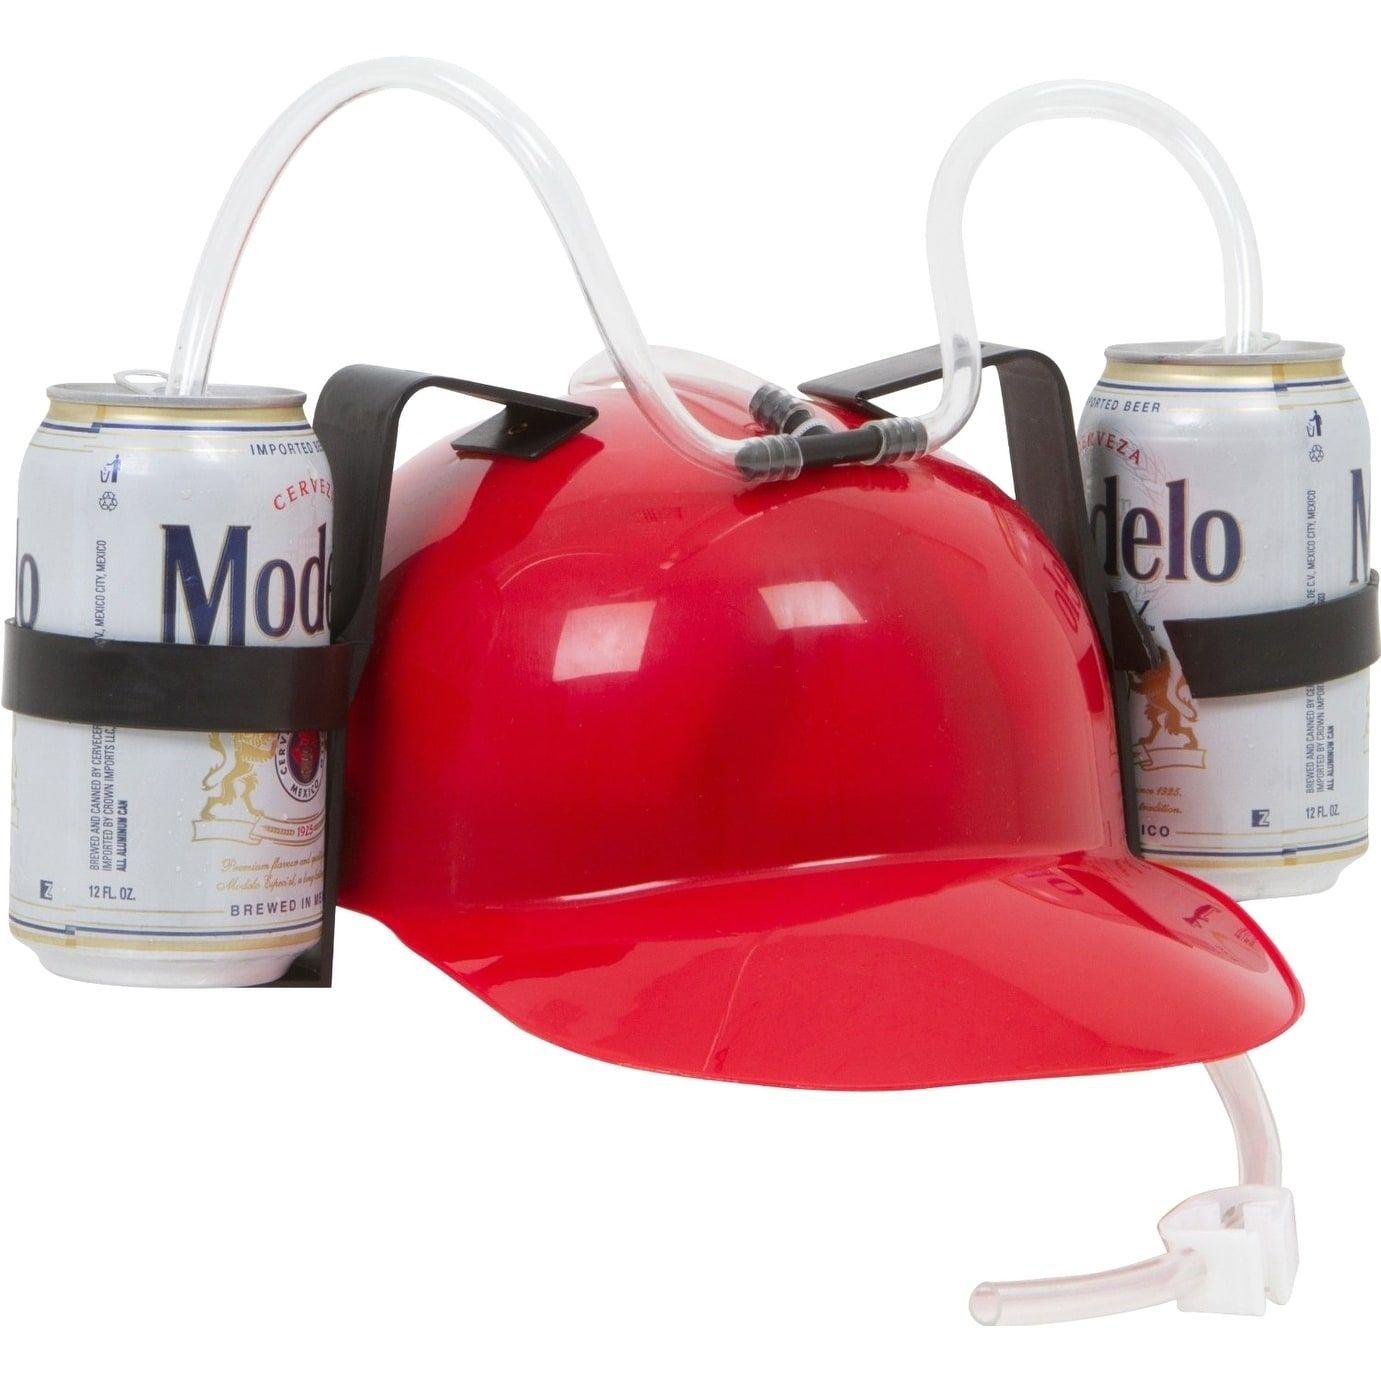 Beer & Soda Guzzler Helmet